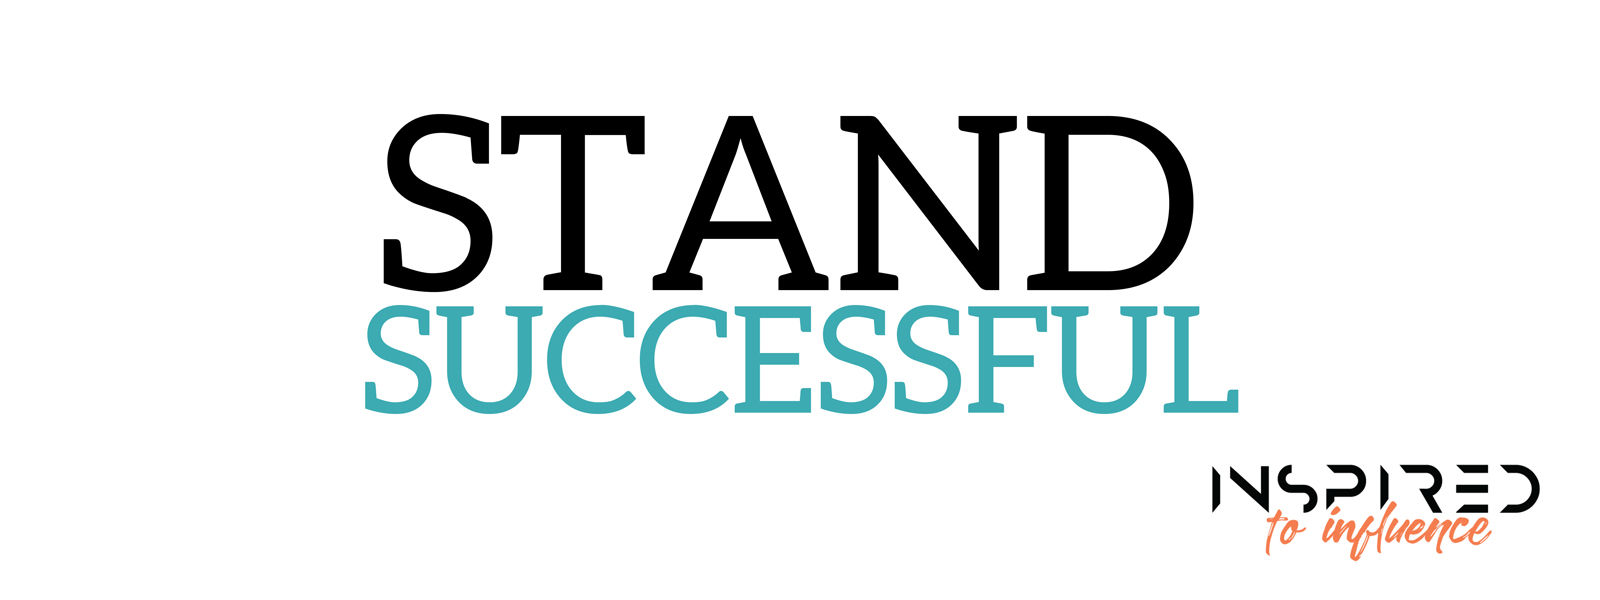 STAND Successful